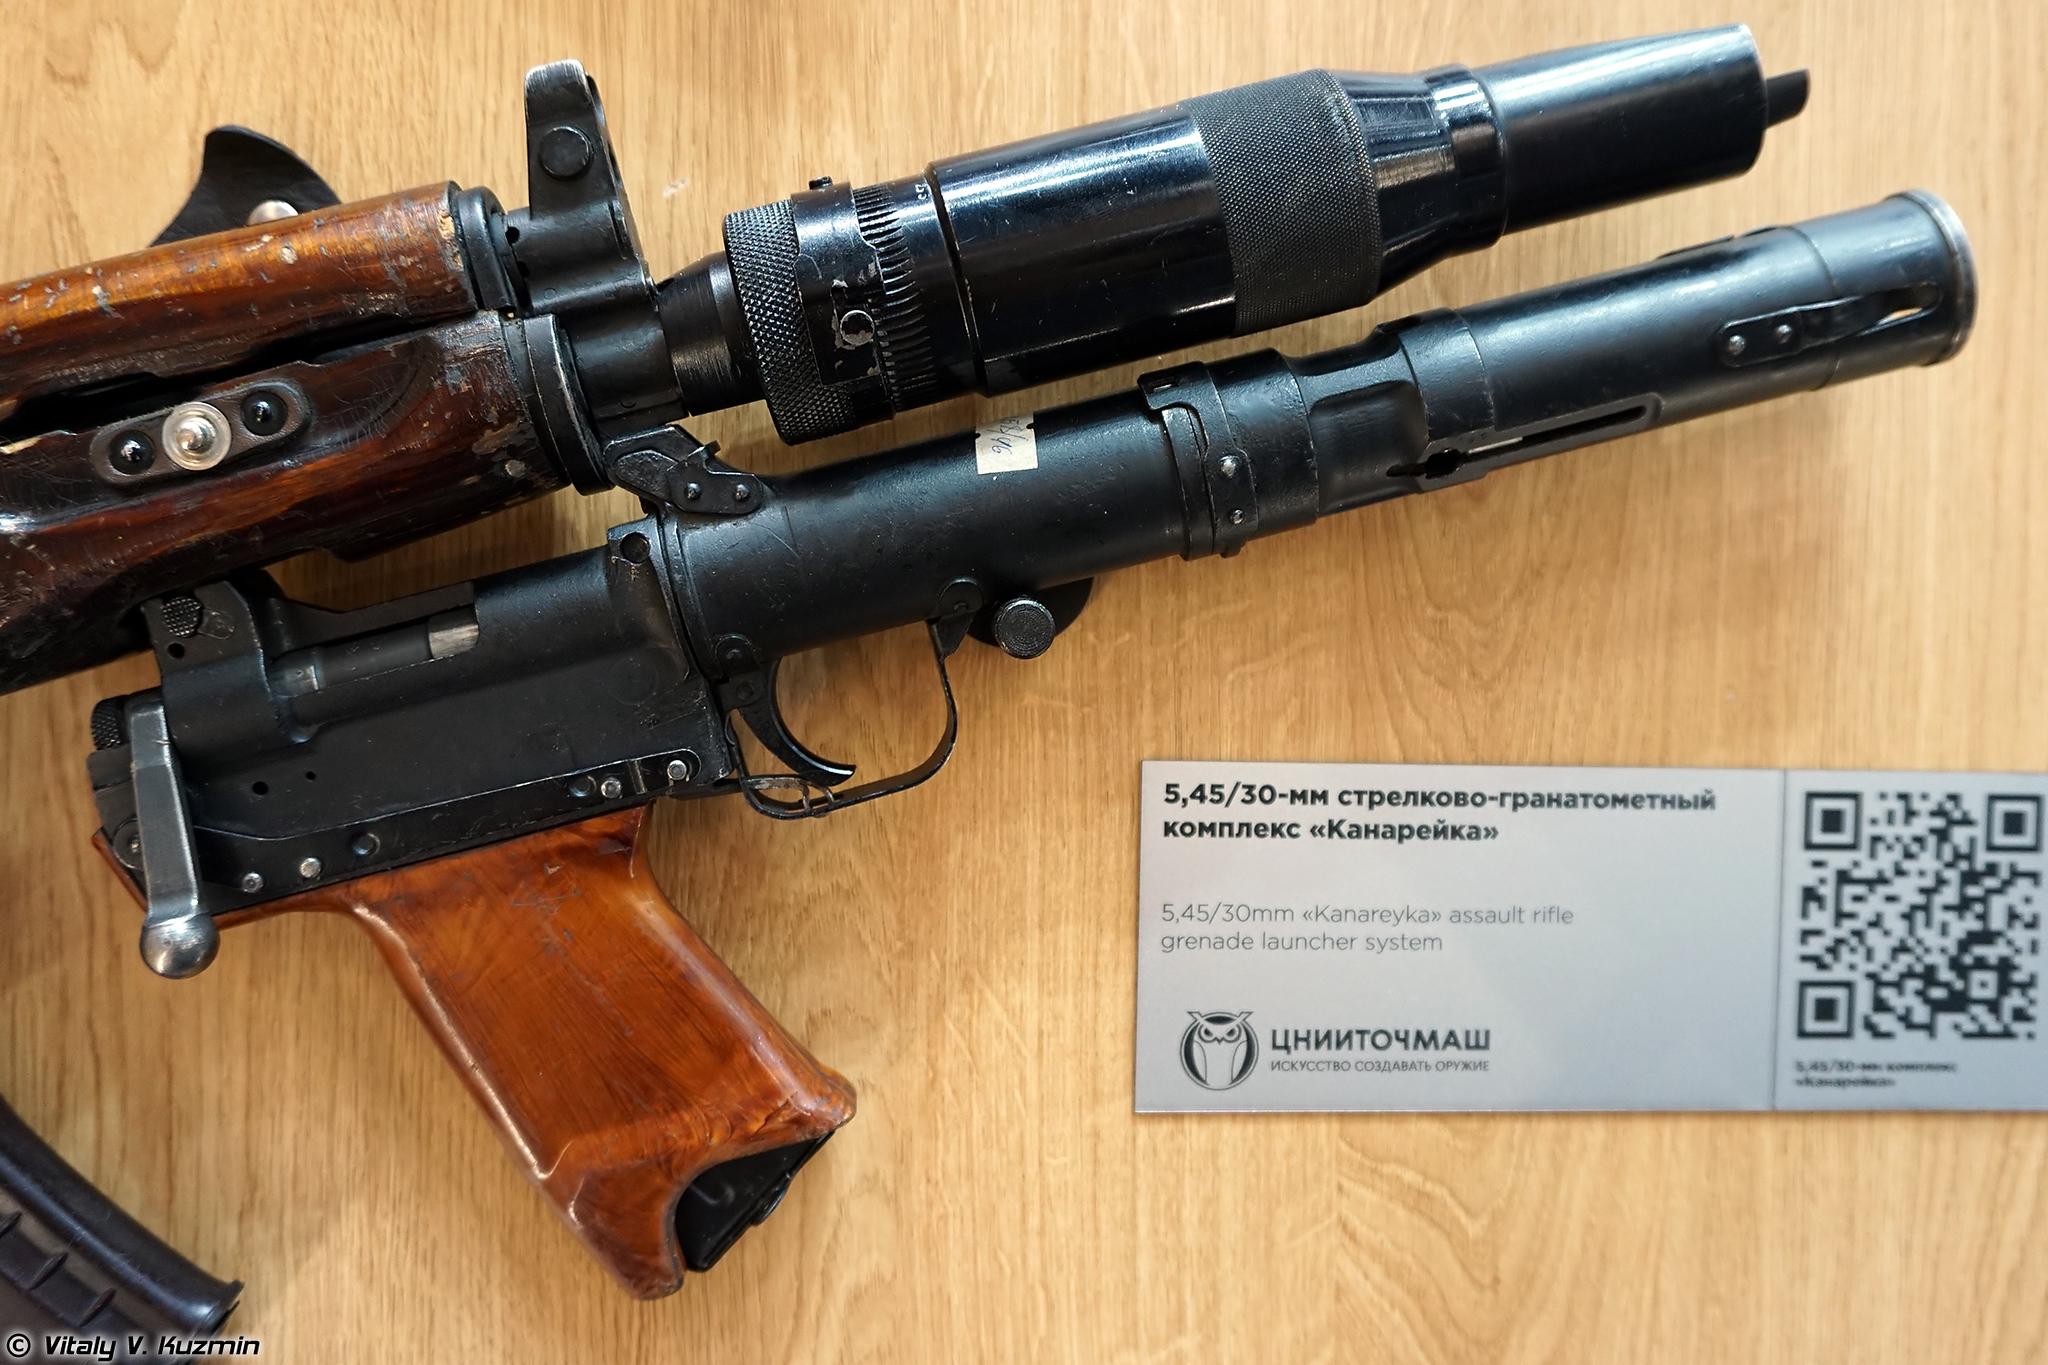 Russian Assault Rifles/Carbines/Machine Guns Thread: #2 - Page 10 Army-2020-Pavilions-046-X4